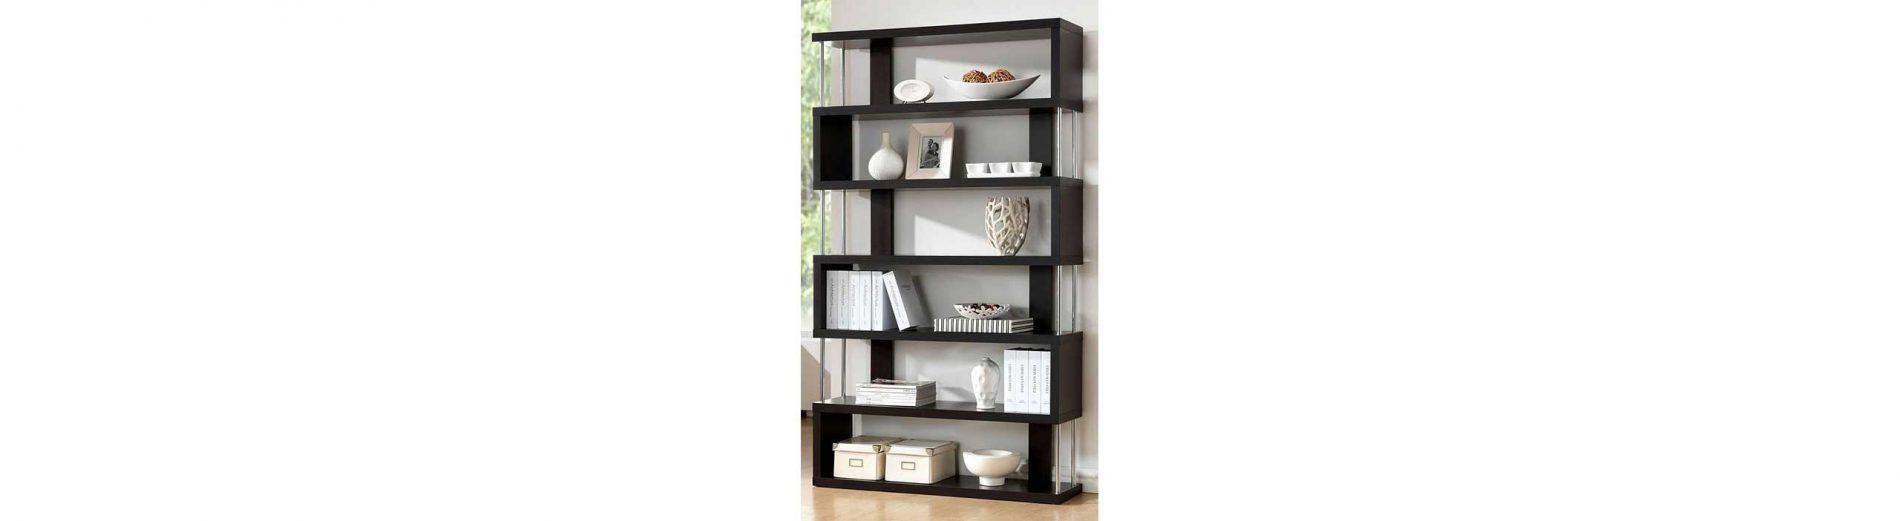 8 Ideas On Bedroom Furniture Shelving Units